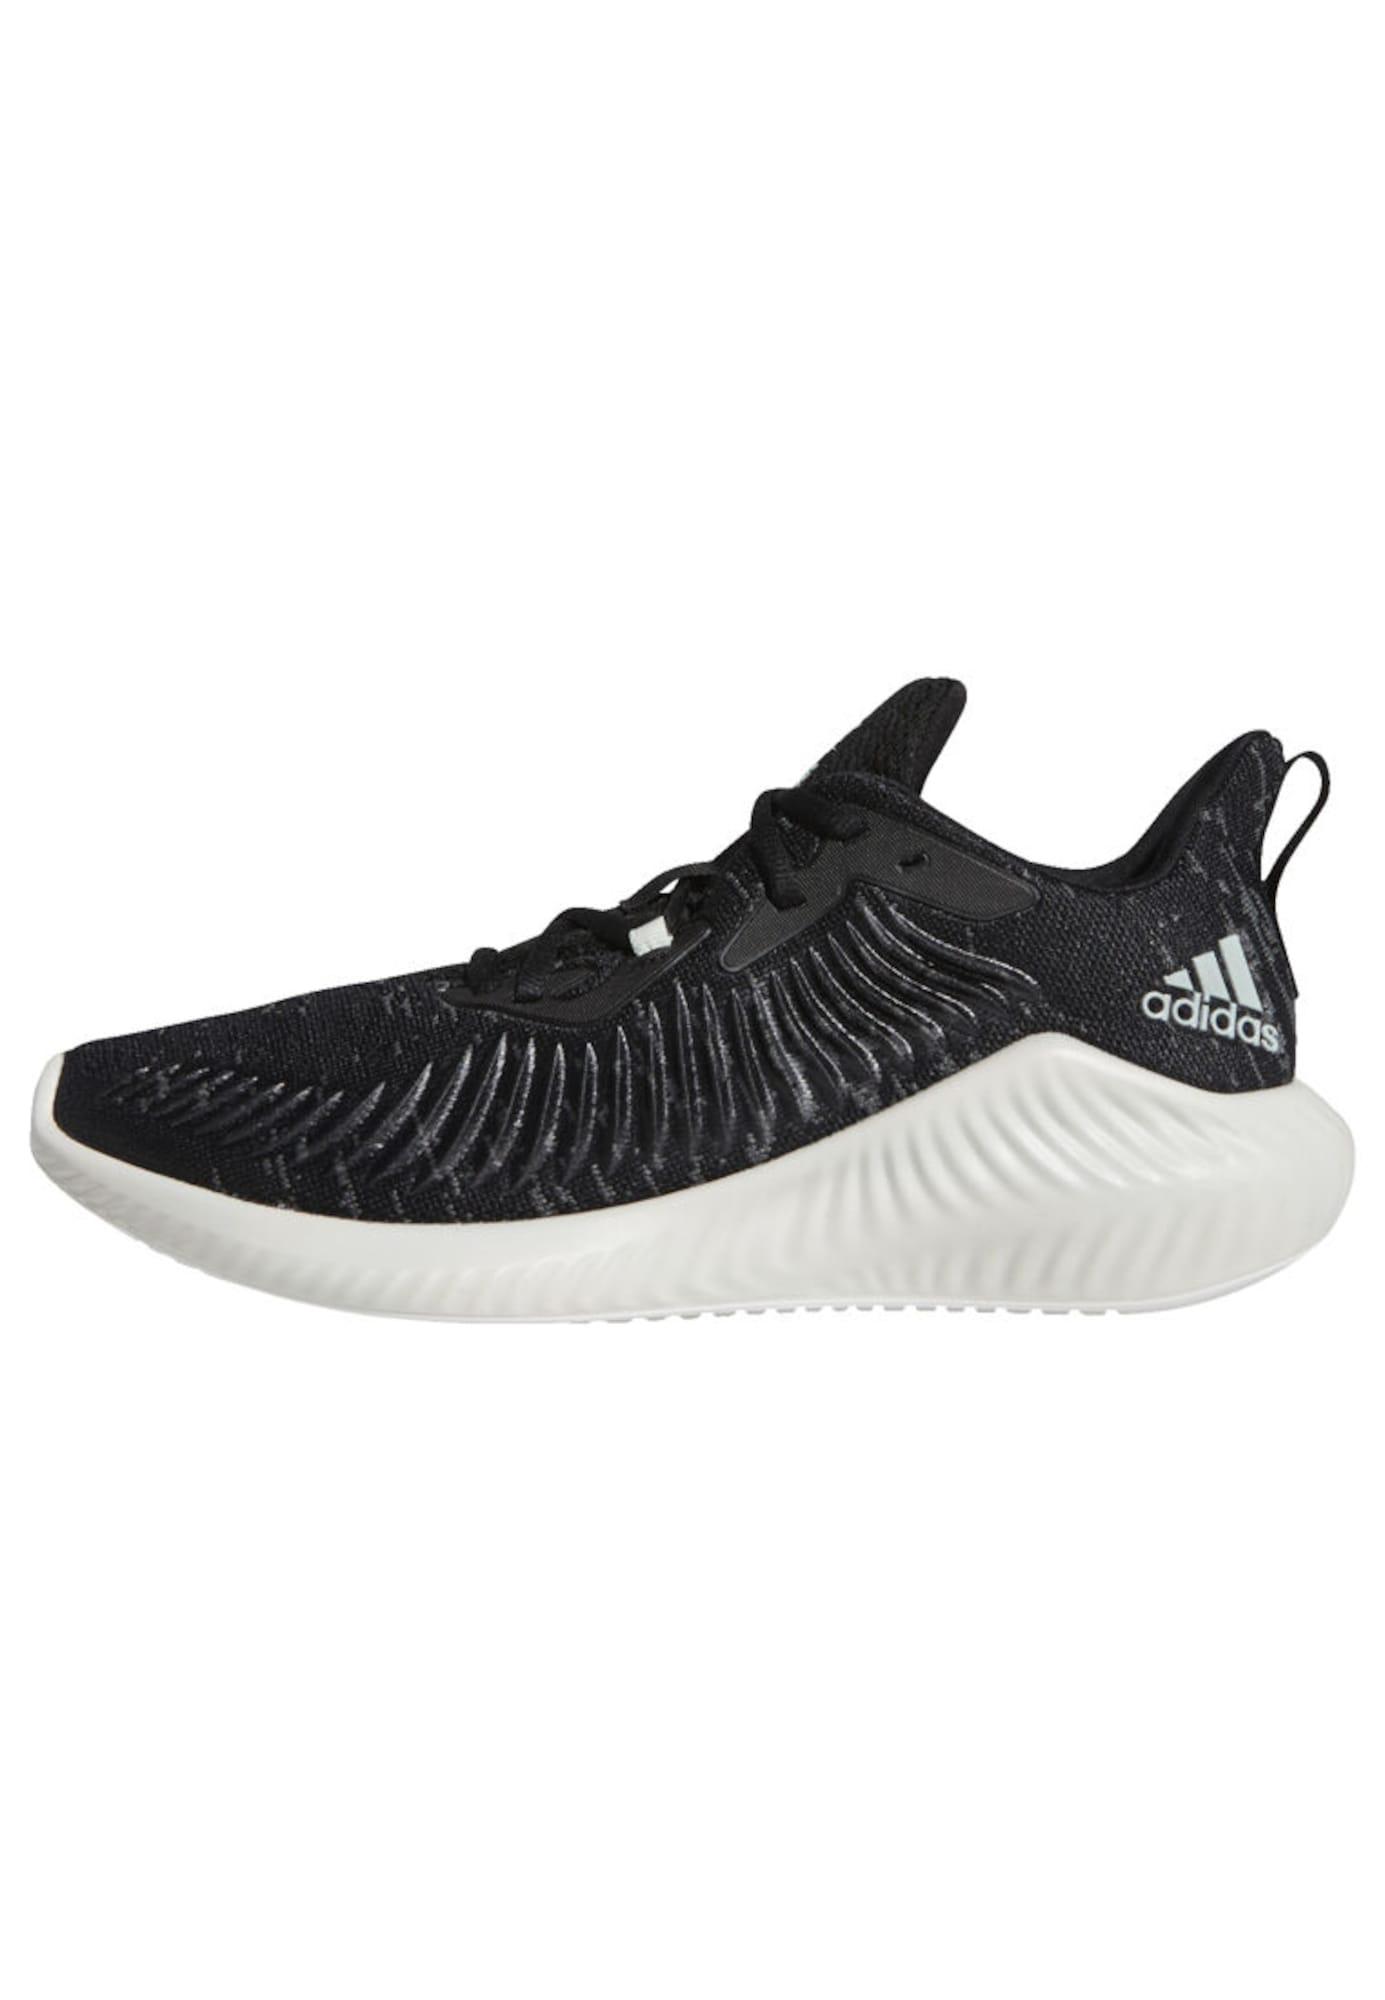 Laufschuhe | Schuhe > Sportschuhe > Laufschuhe | Schwarz | ADIDAS PERFORMANCE